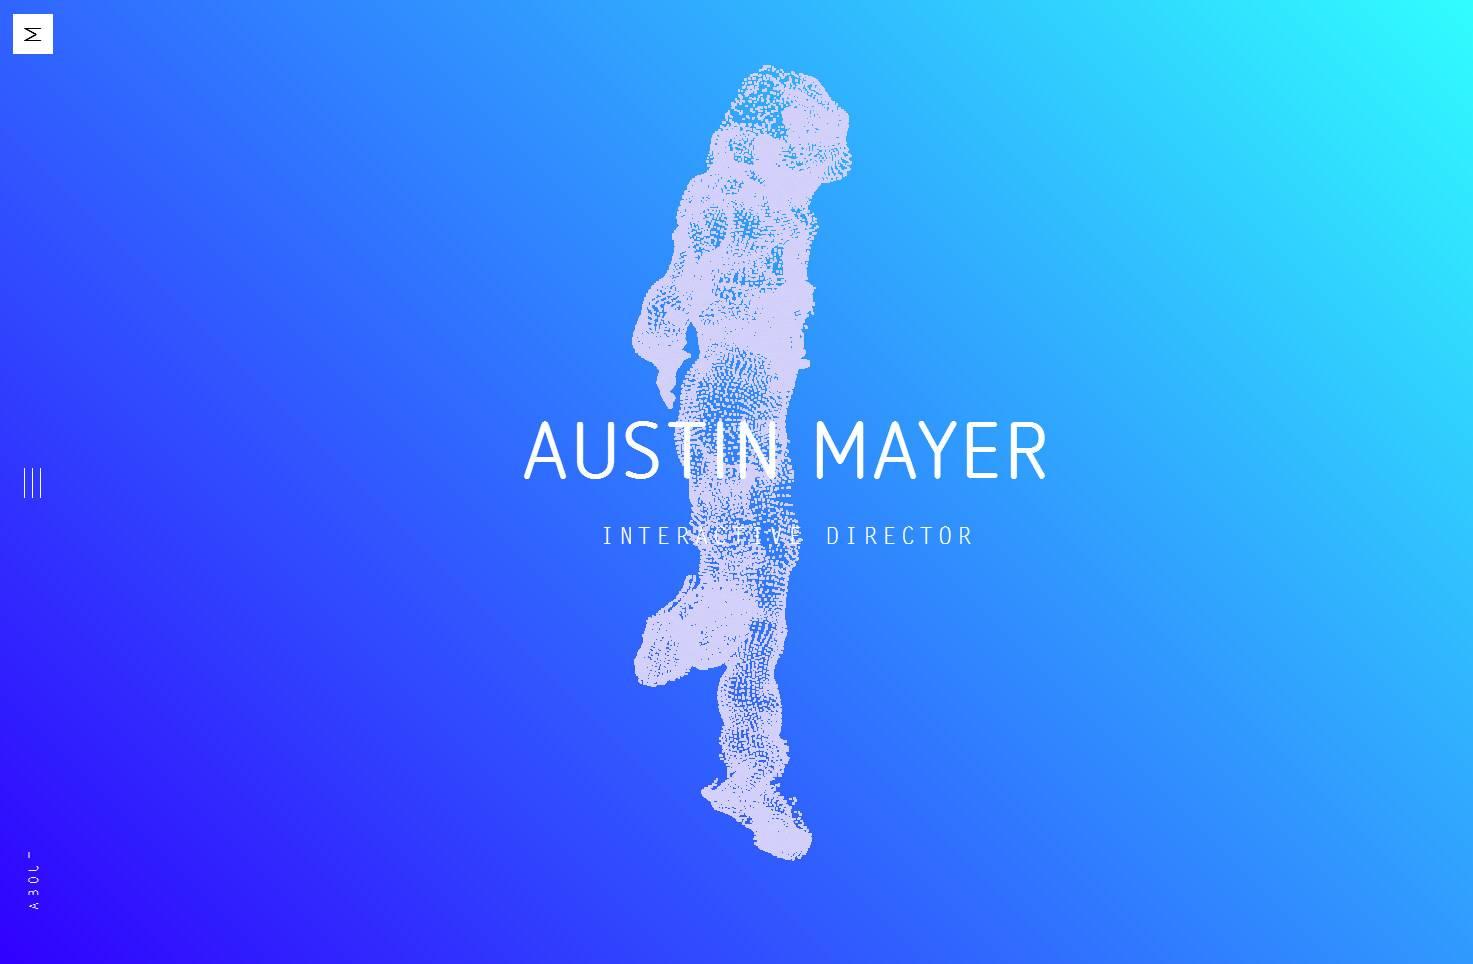 Austin mayer创意粒子酷站